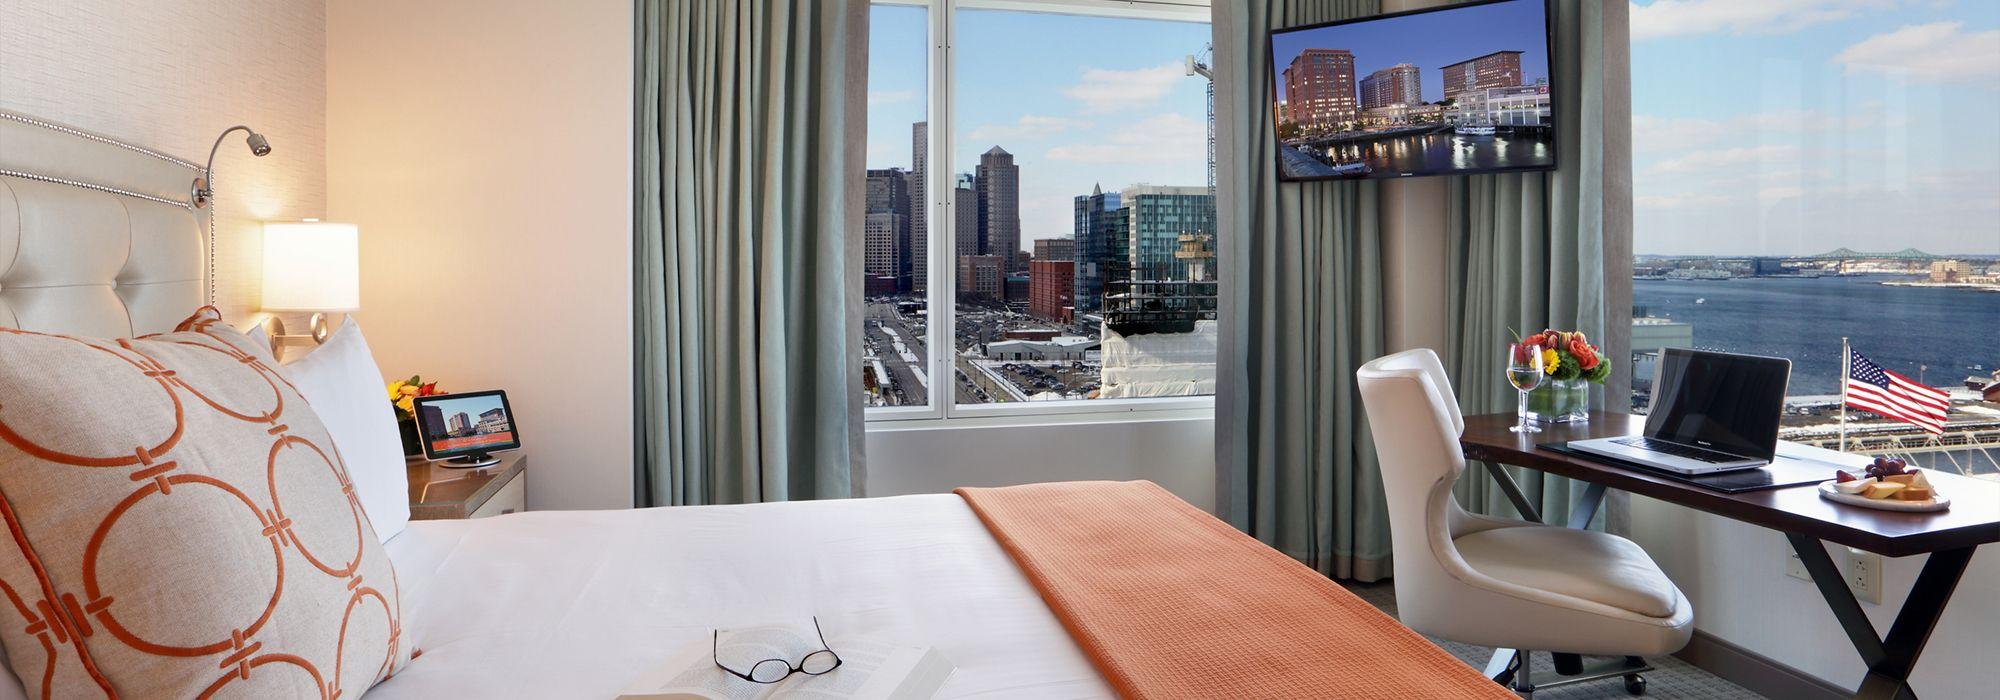 Hotel GDPR Compliance Room